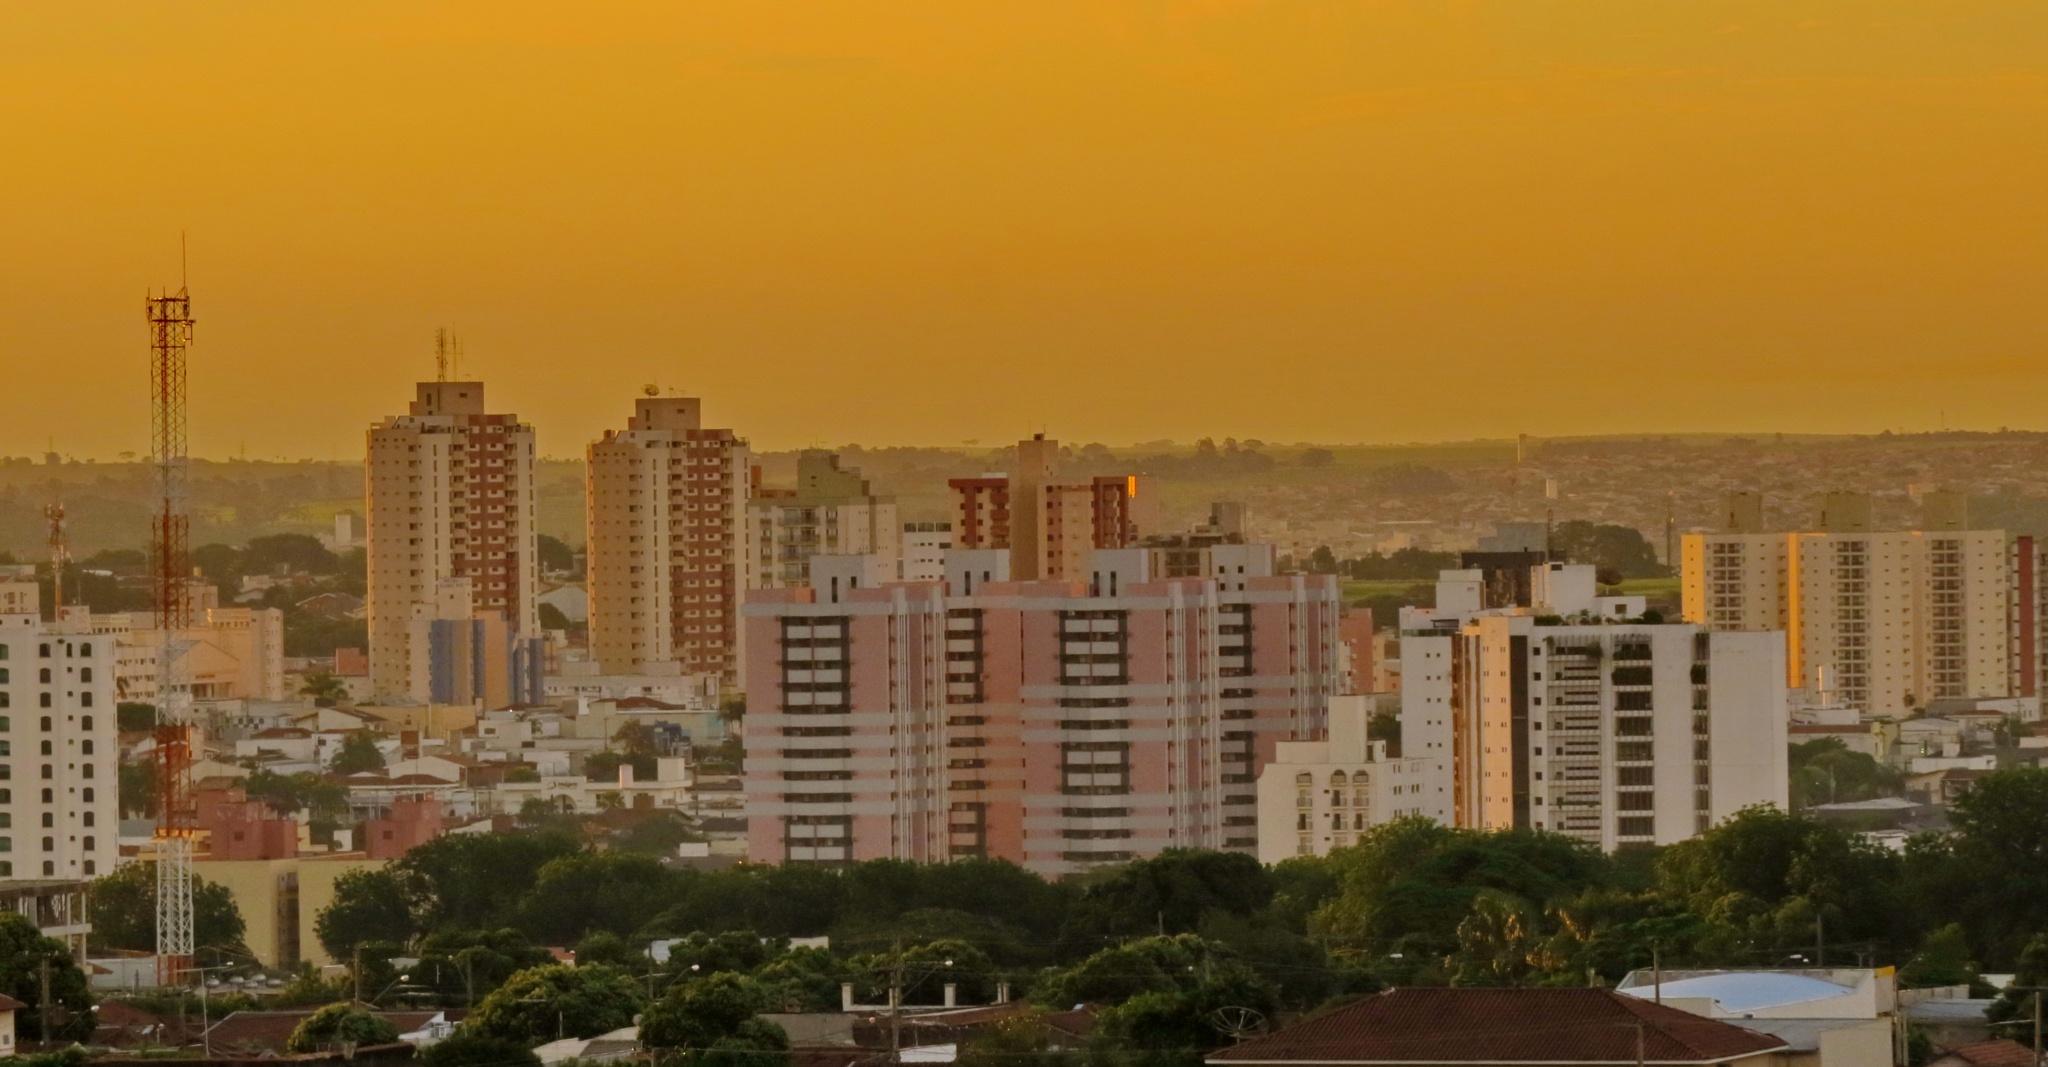 City of gold by Nestor